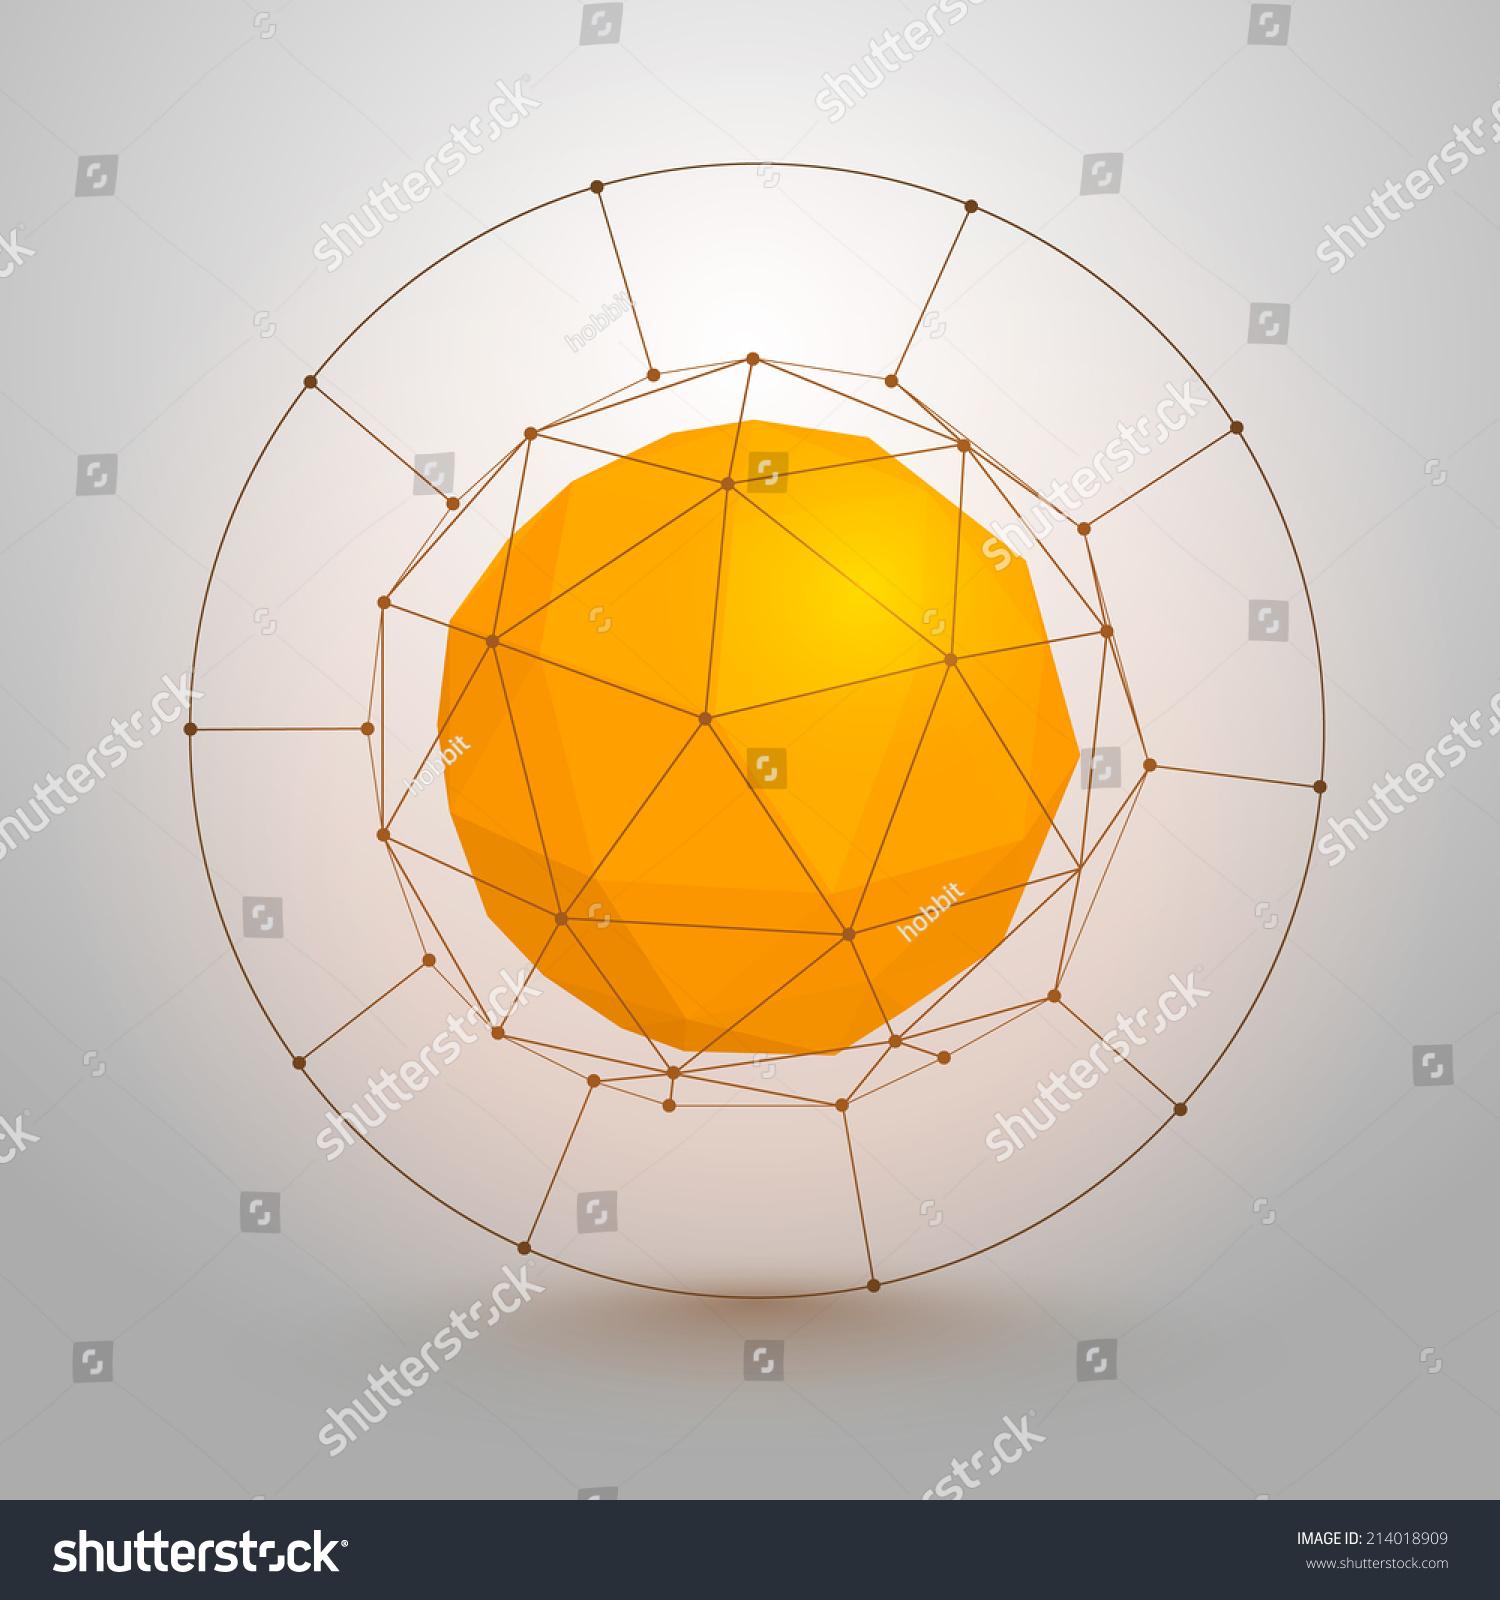 Origami Paper Sun Sun 3d Sign Stock Vector 214018909 ... - photo#17